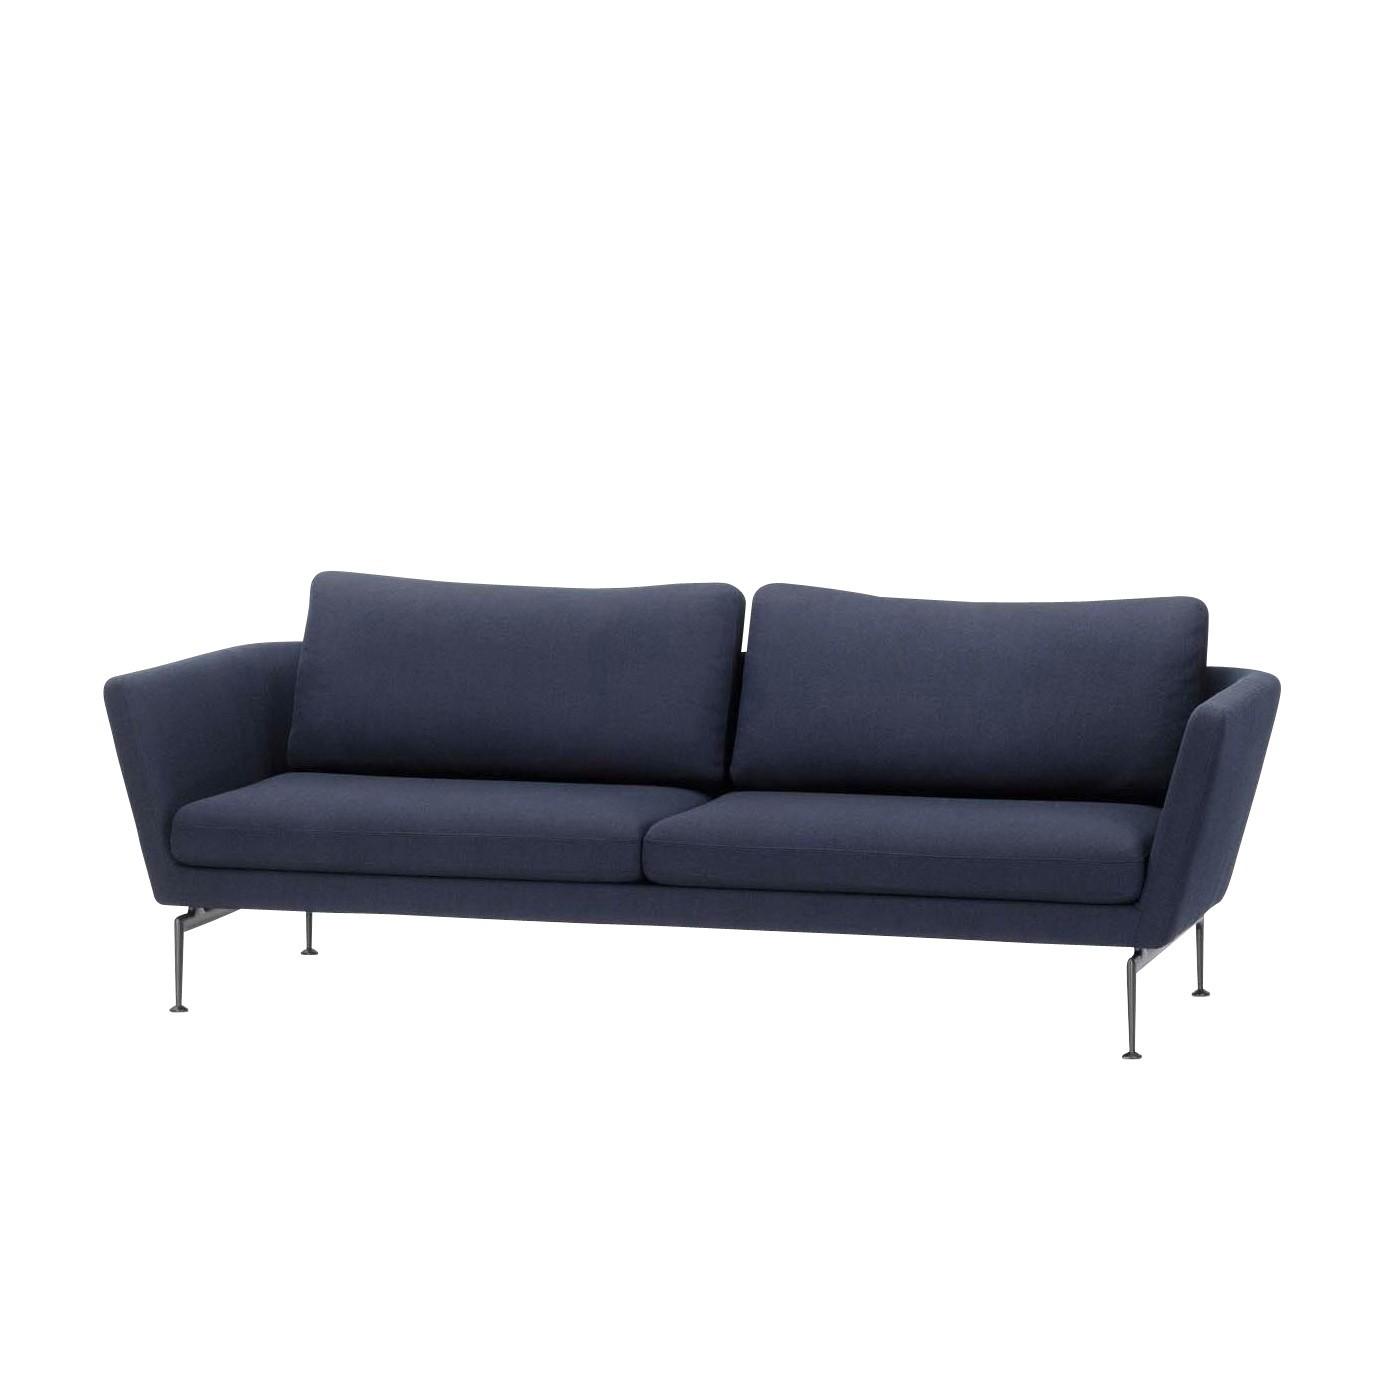 vitra suita citterio 3 sitzer sofa ambientedirect. Black Bedroom Furniture Sets. Home Design Ideas